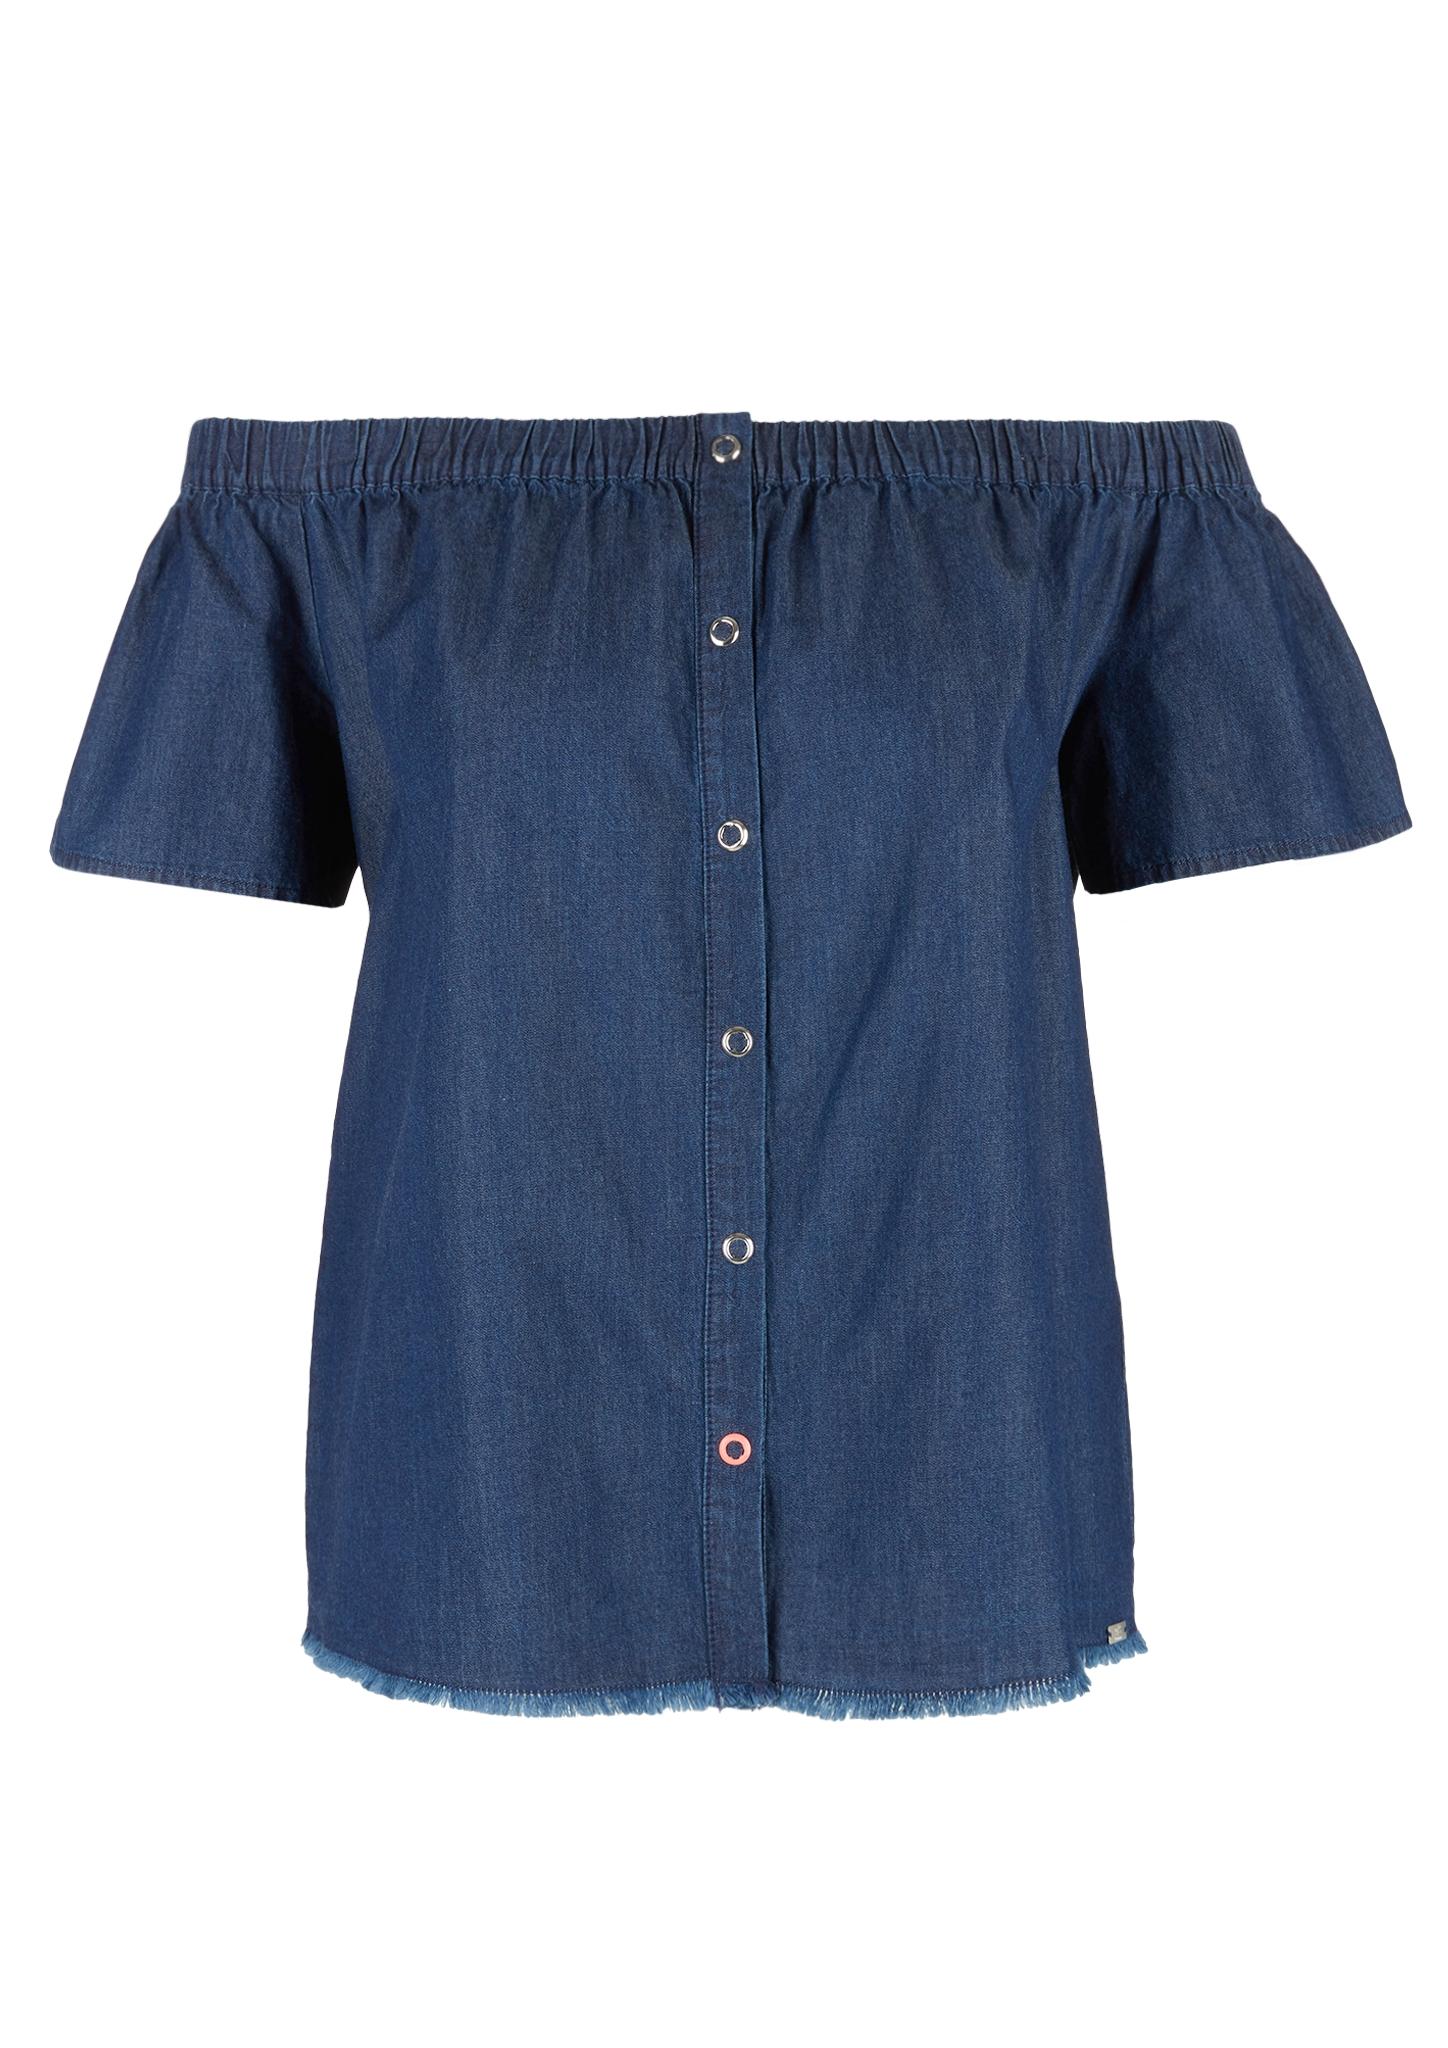 Carmenshirt | Bekleidung > Shirts > Carmenshirts & Wasserfallshirts | Q/S designed by